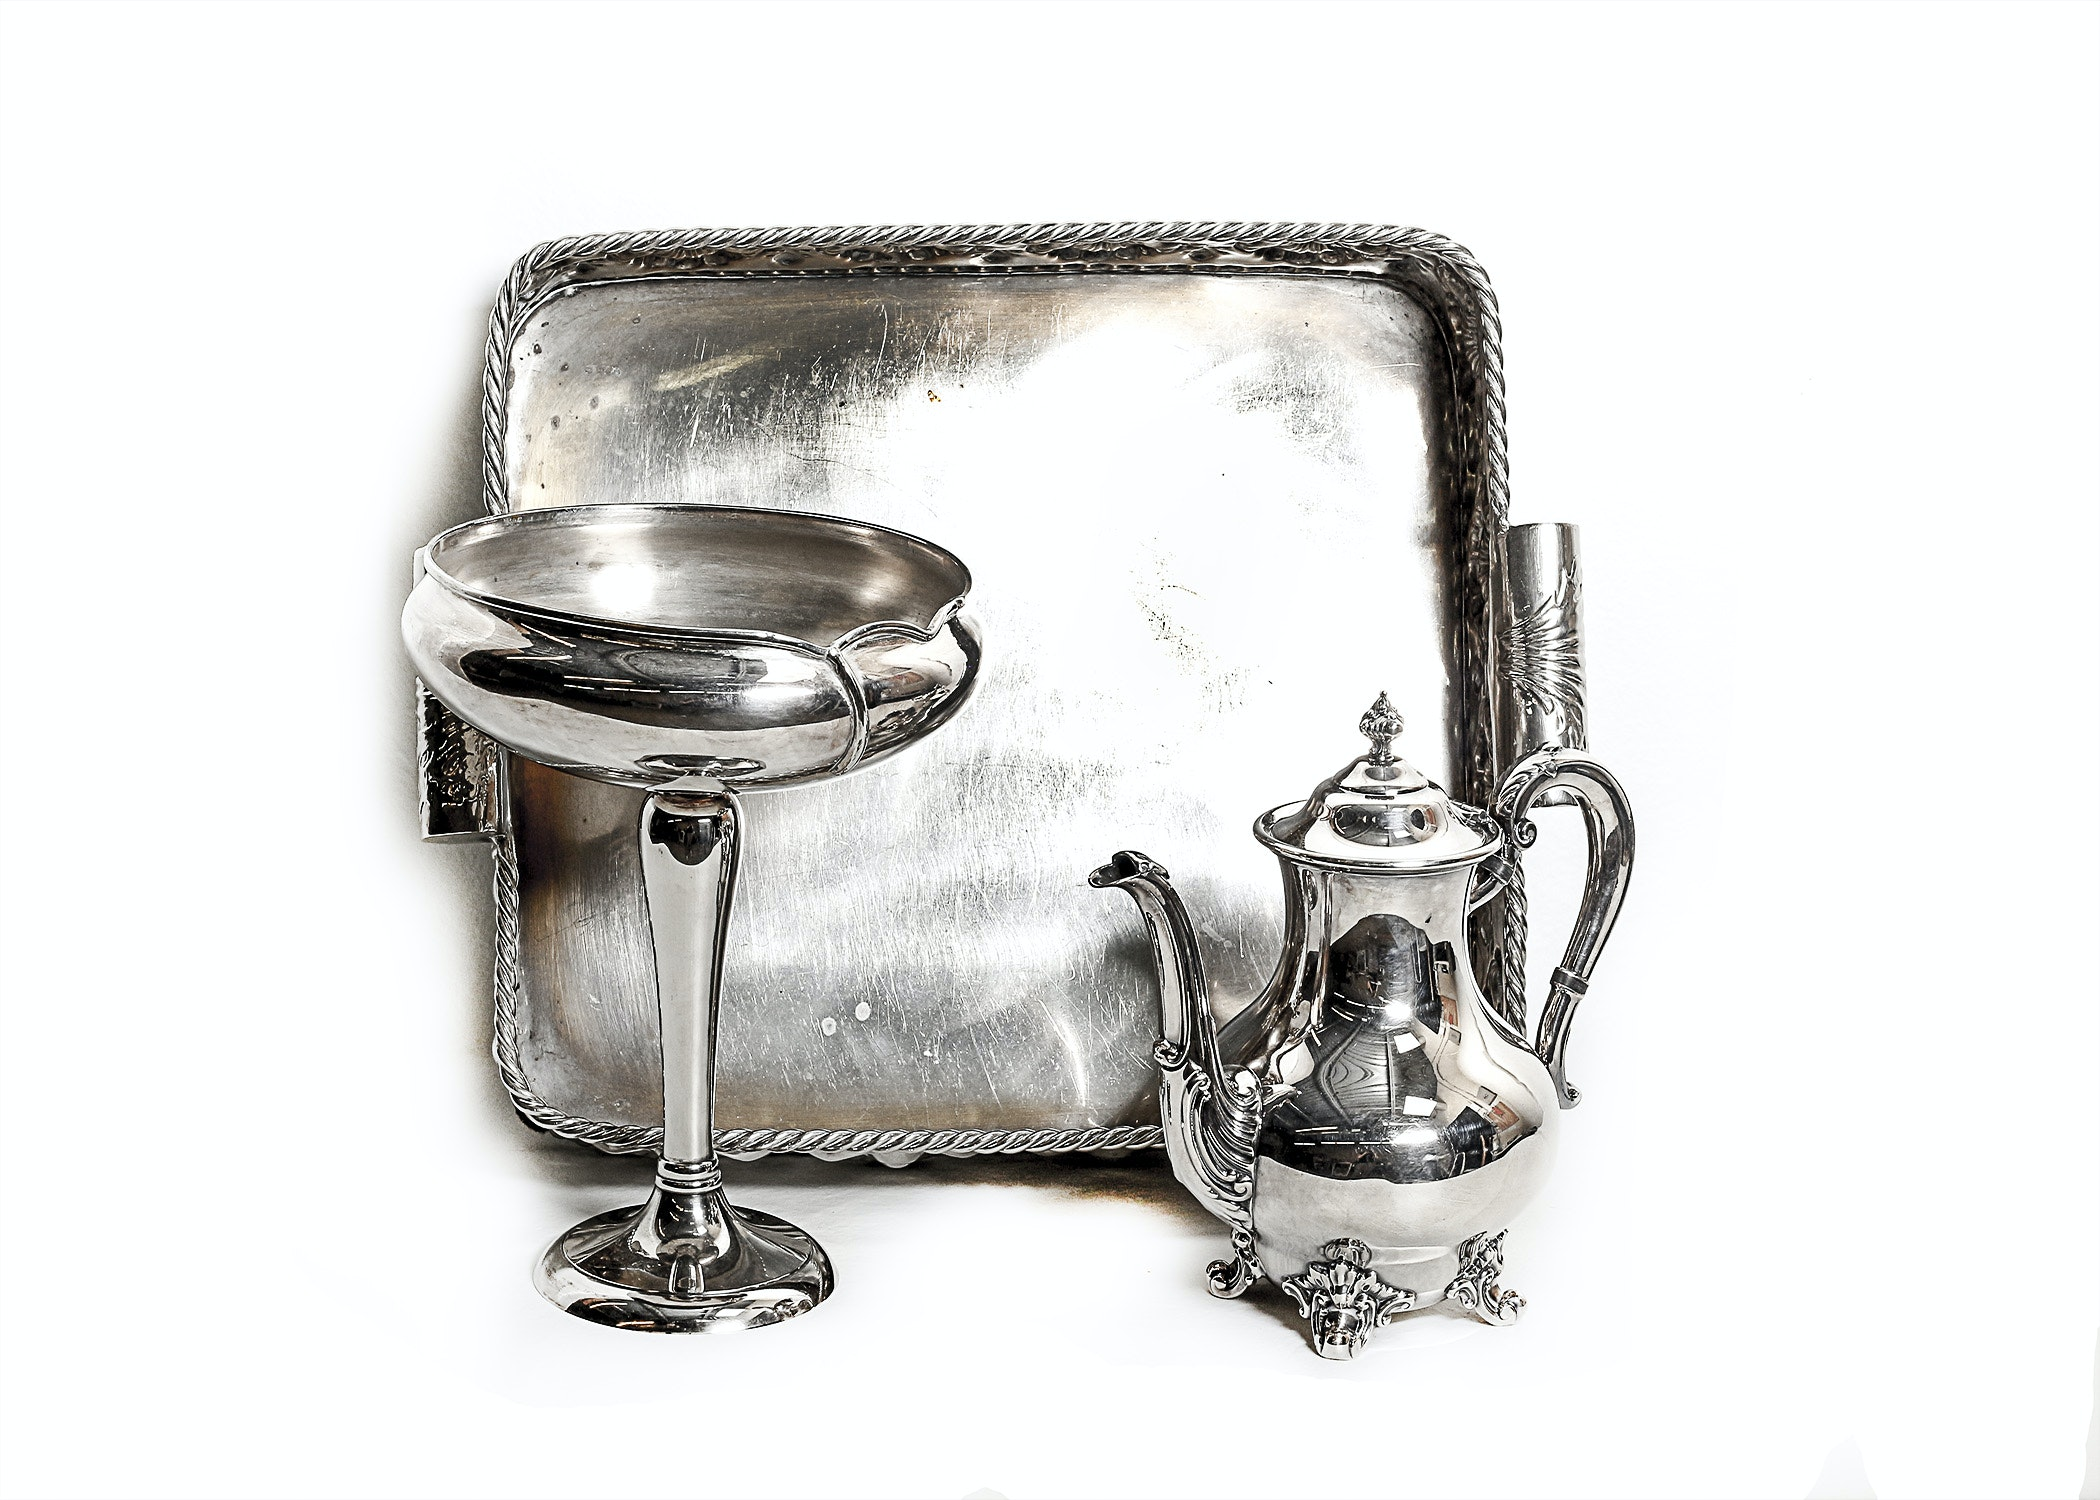 Trio of Silverplated Decor Items